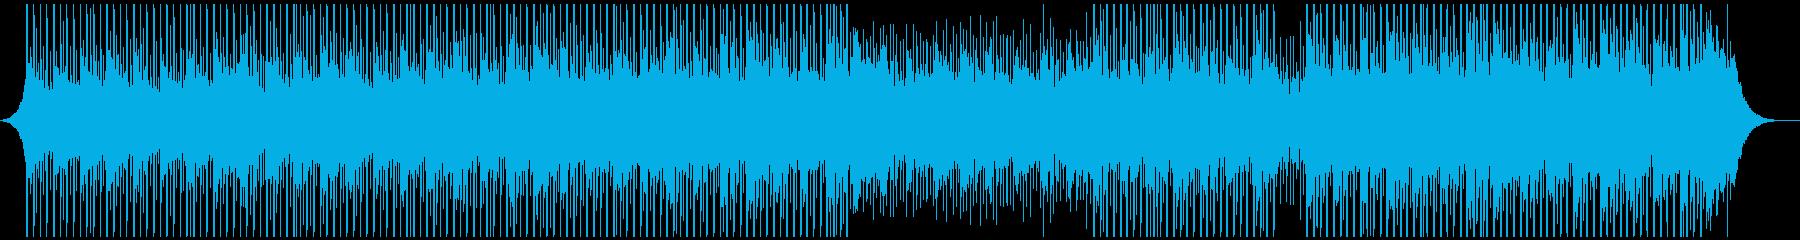 health's reproduced waveform